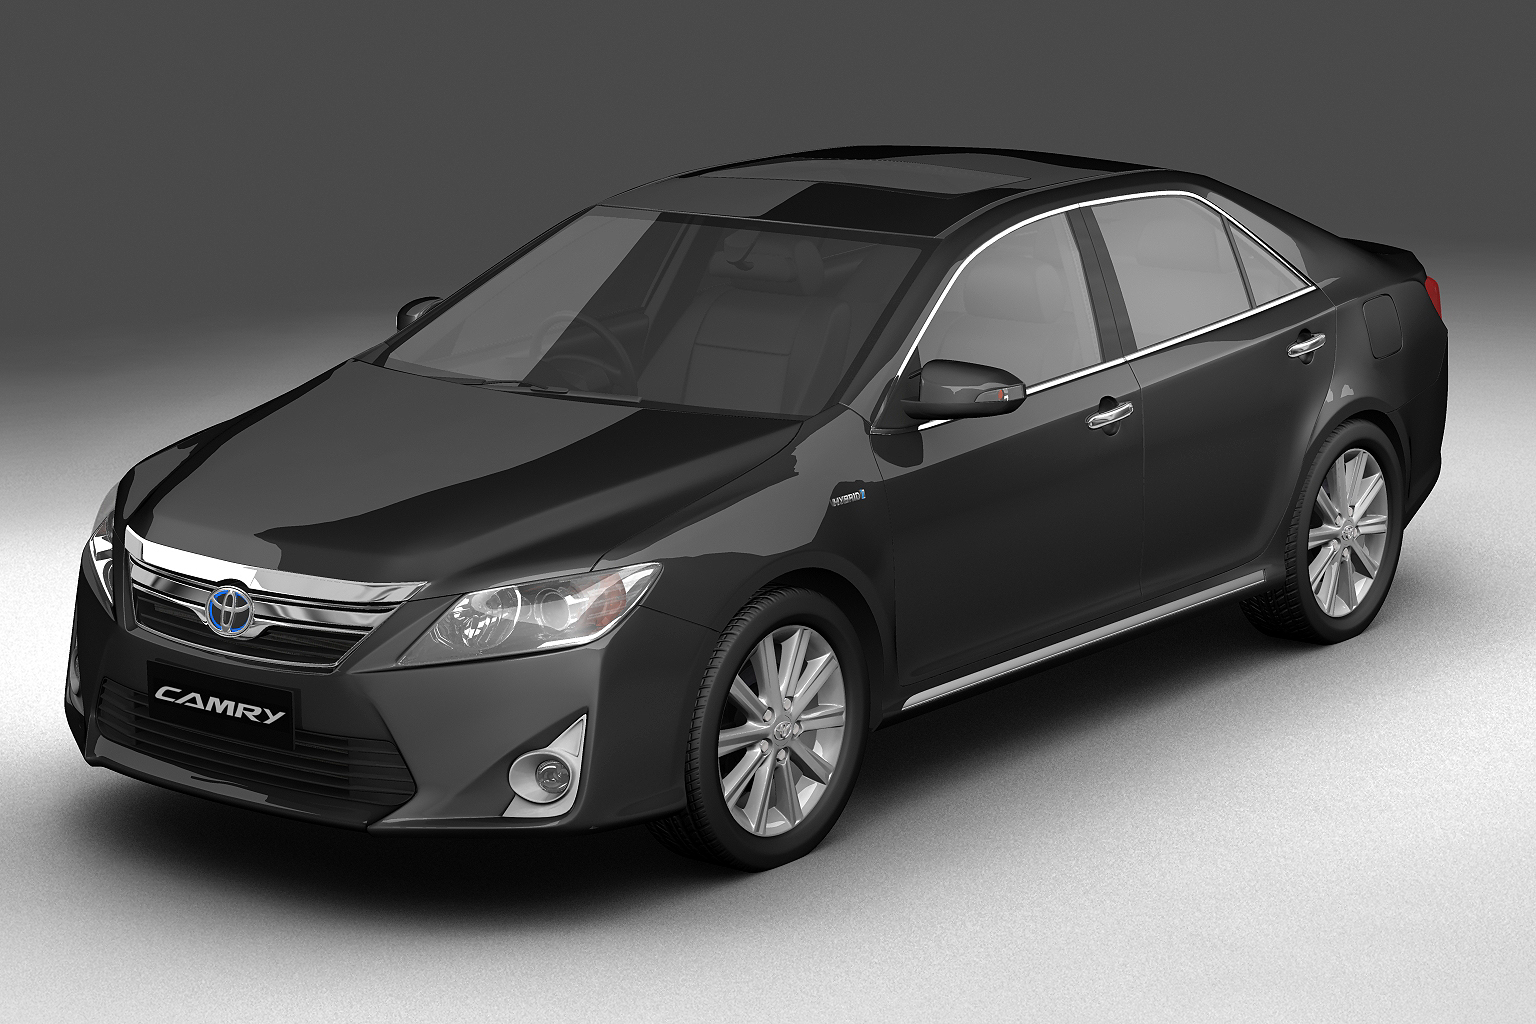 2012 toyota camry hybrid (asian) 3d model 3ds max fbx c4d lwo hrc xsi obj 136182